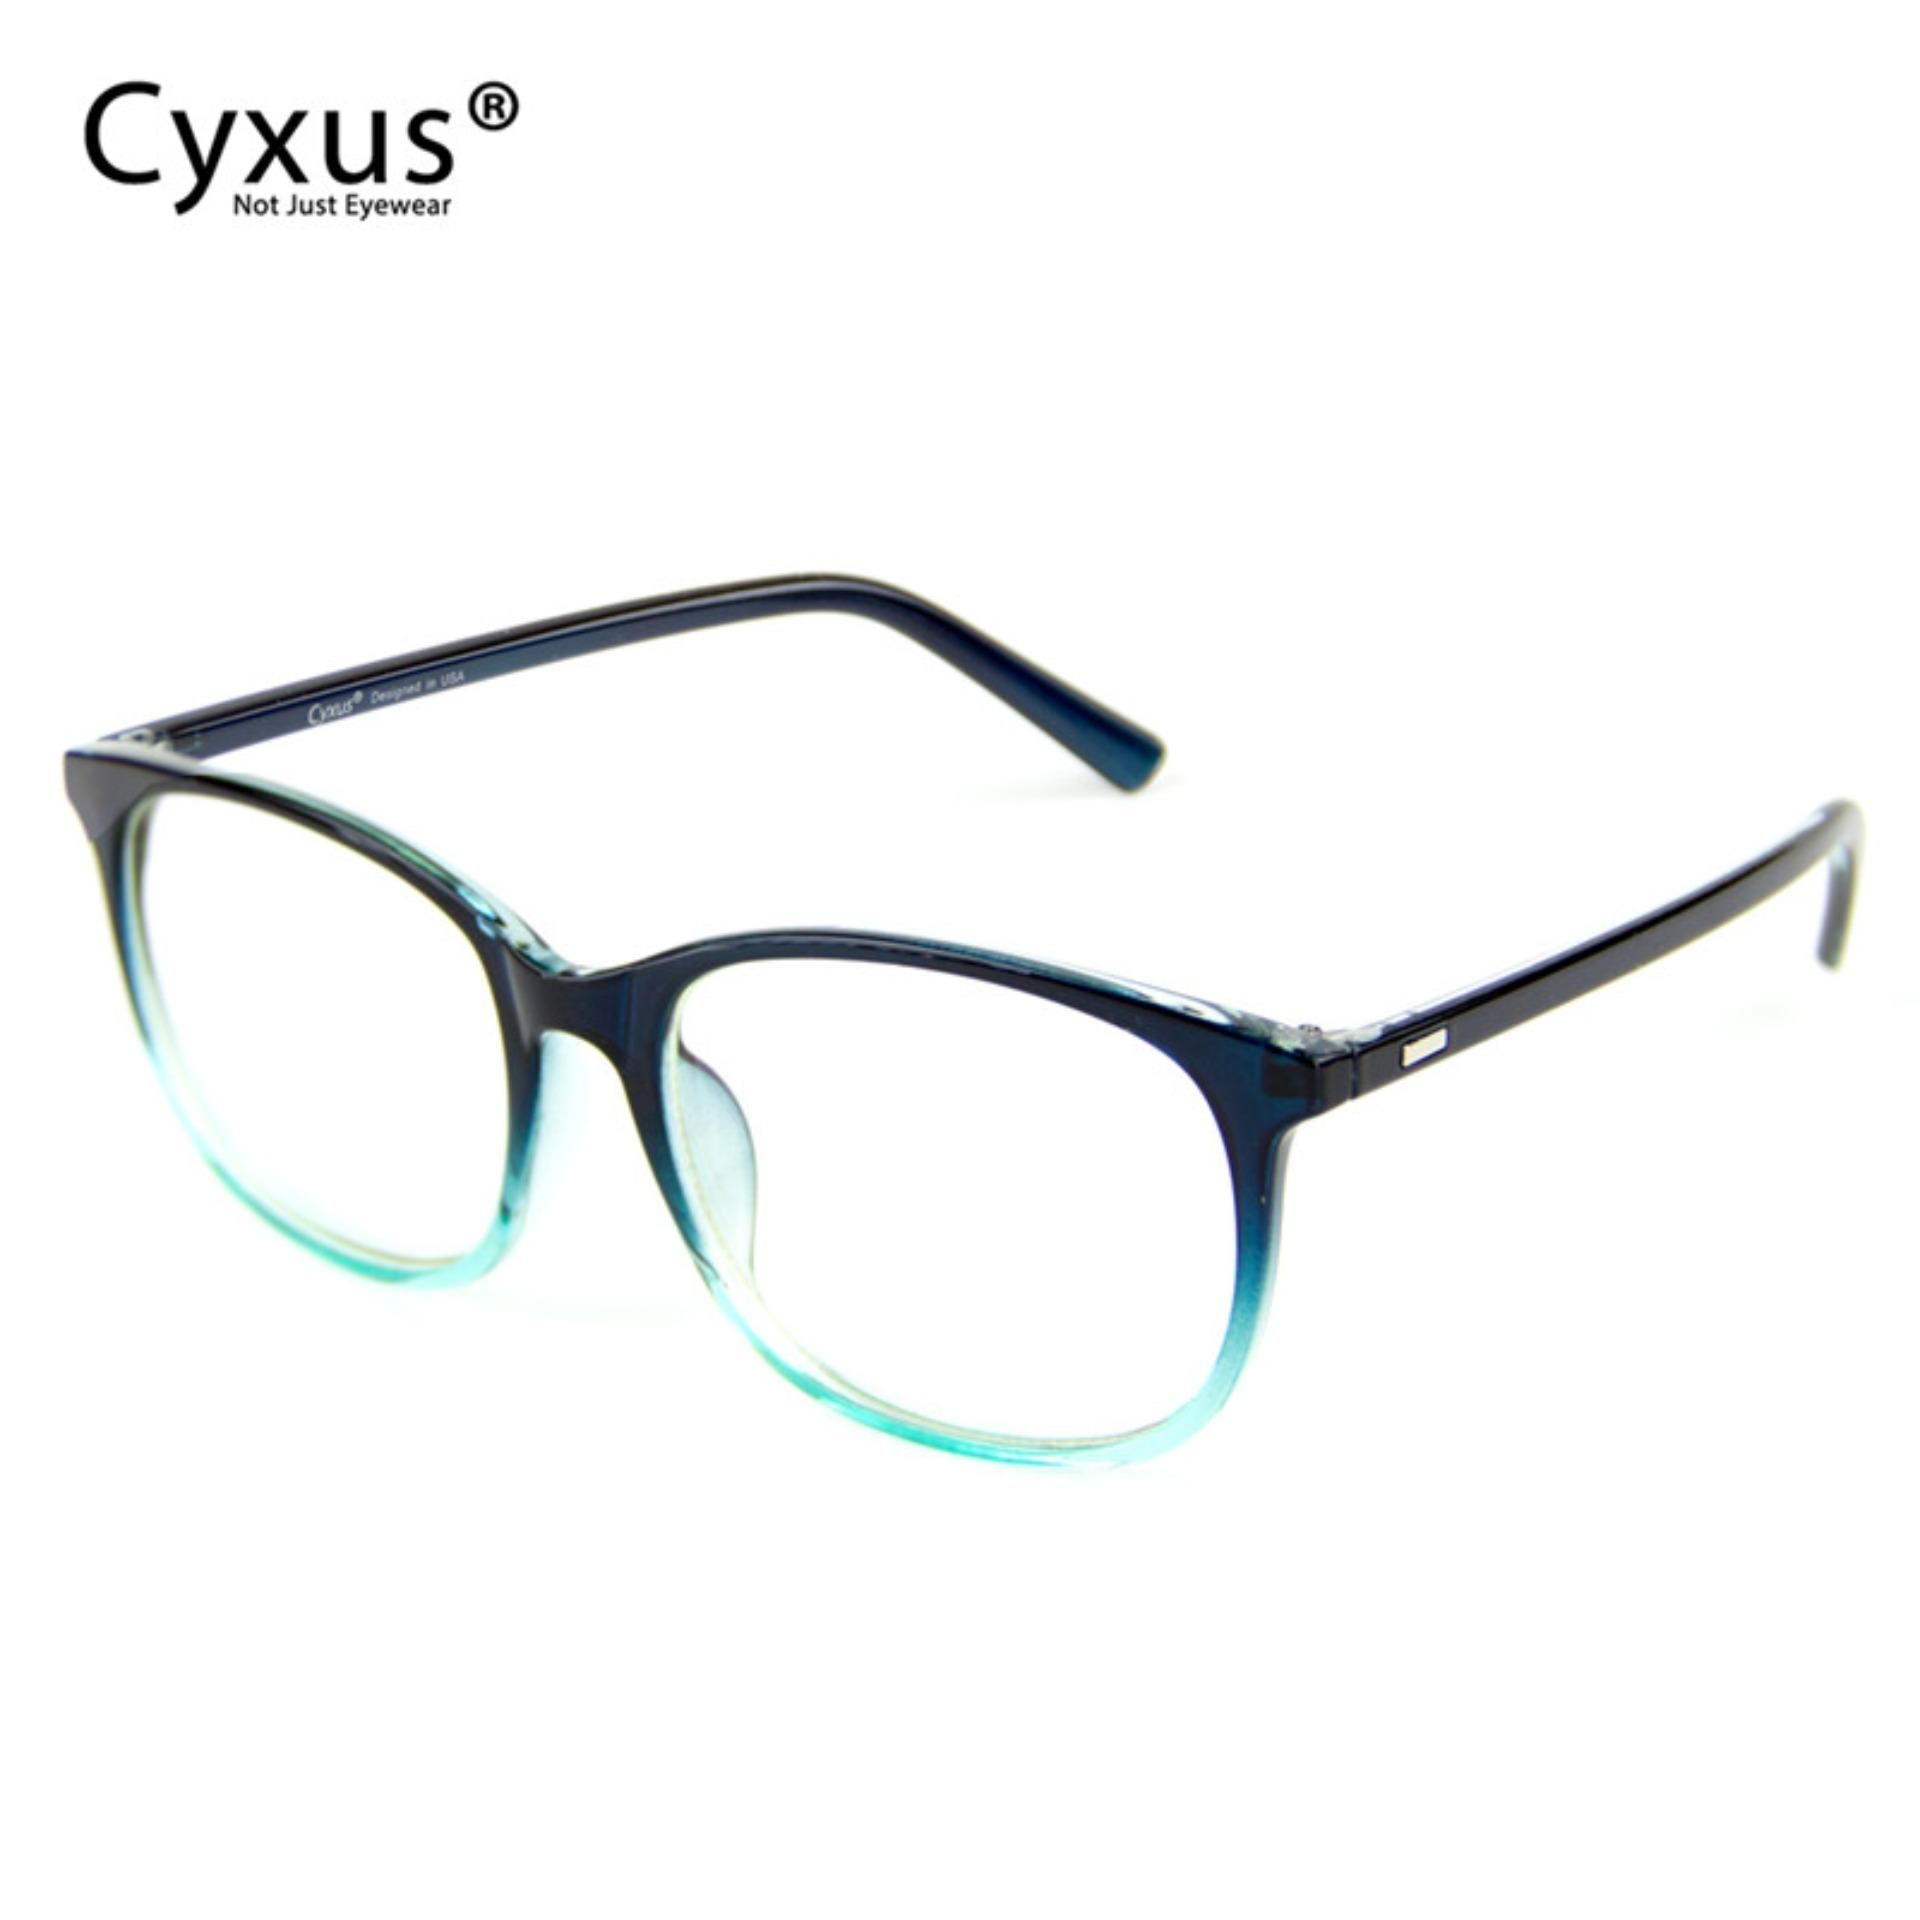 Cyxus Blue Light Blocking Gaming Computer Glasses Anti Eyestrain Large Frame Unisex Eyewear Gradient Lake Blue Brown Leopard) Cyxus Discount